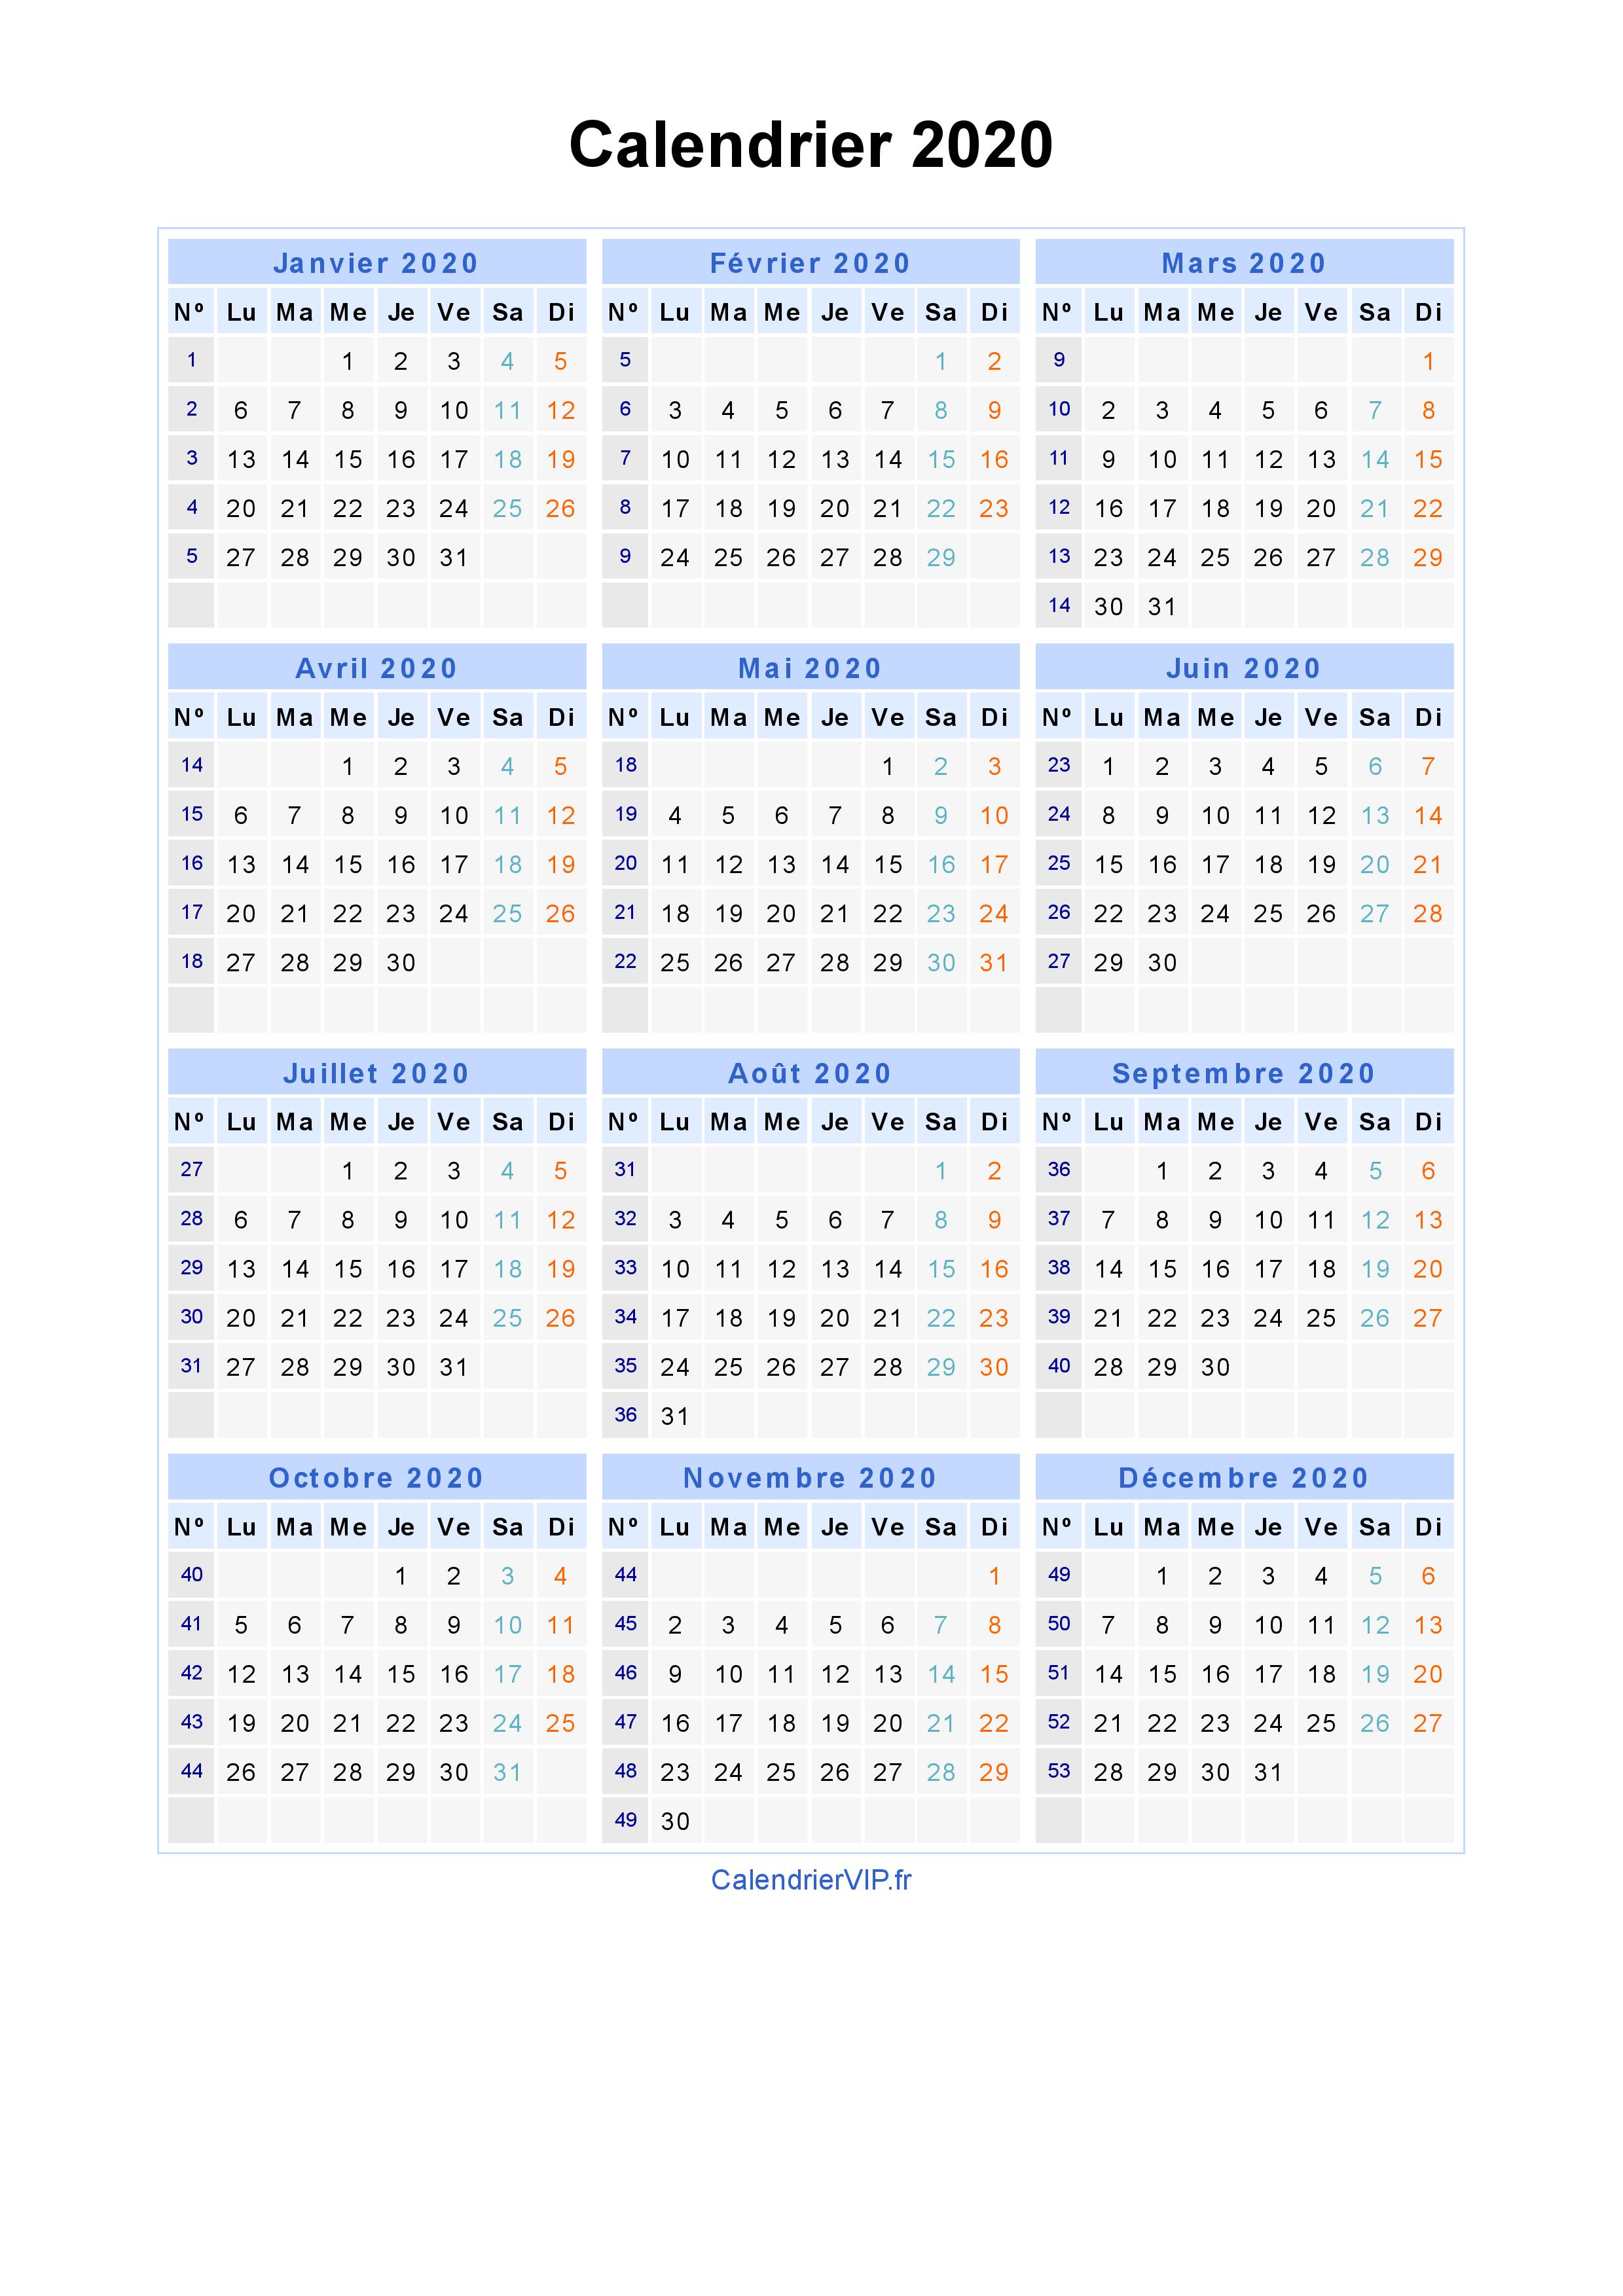 Calendrier A Imprimer Novembre 2020.Calendrier 2020 A Imprimer Gratuit En Pdf Et Excel